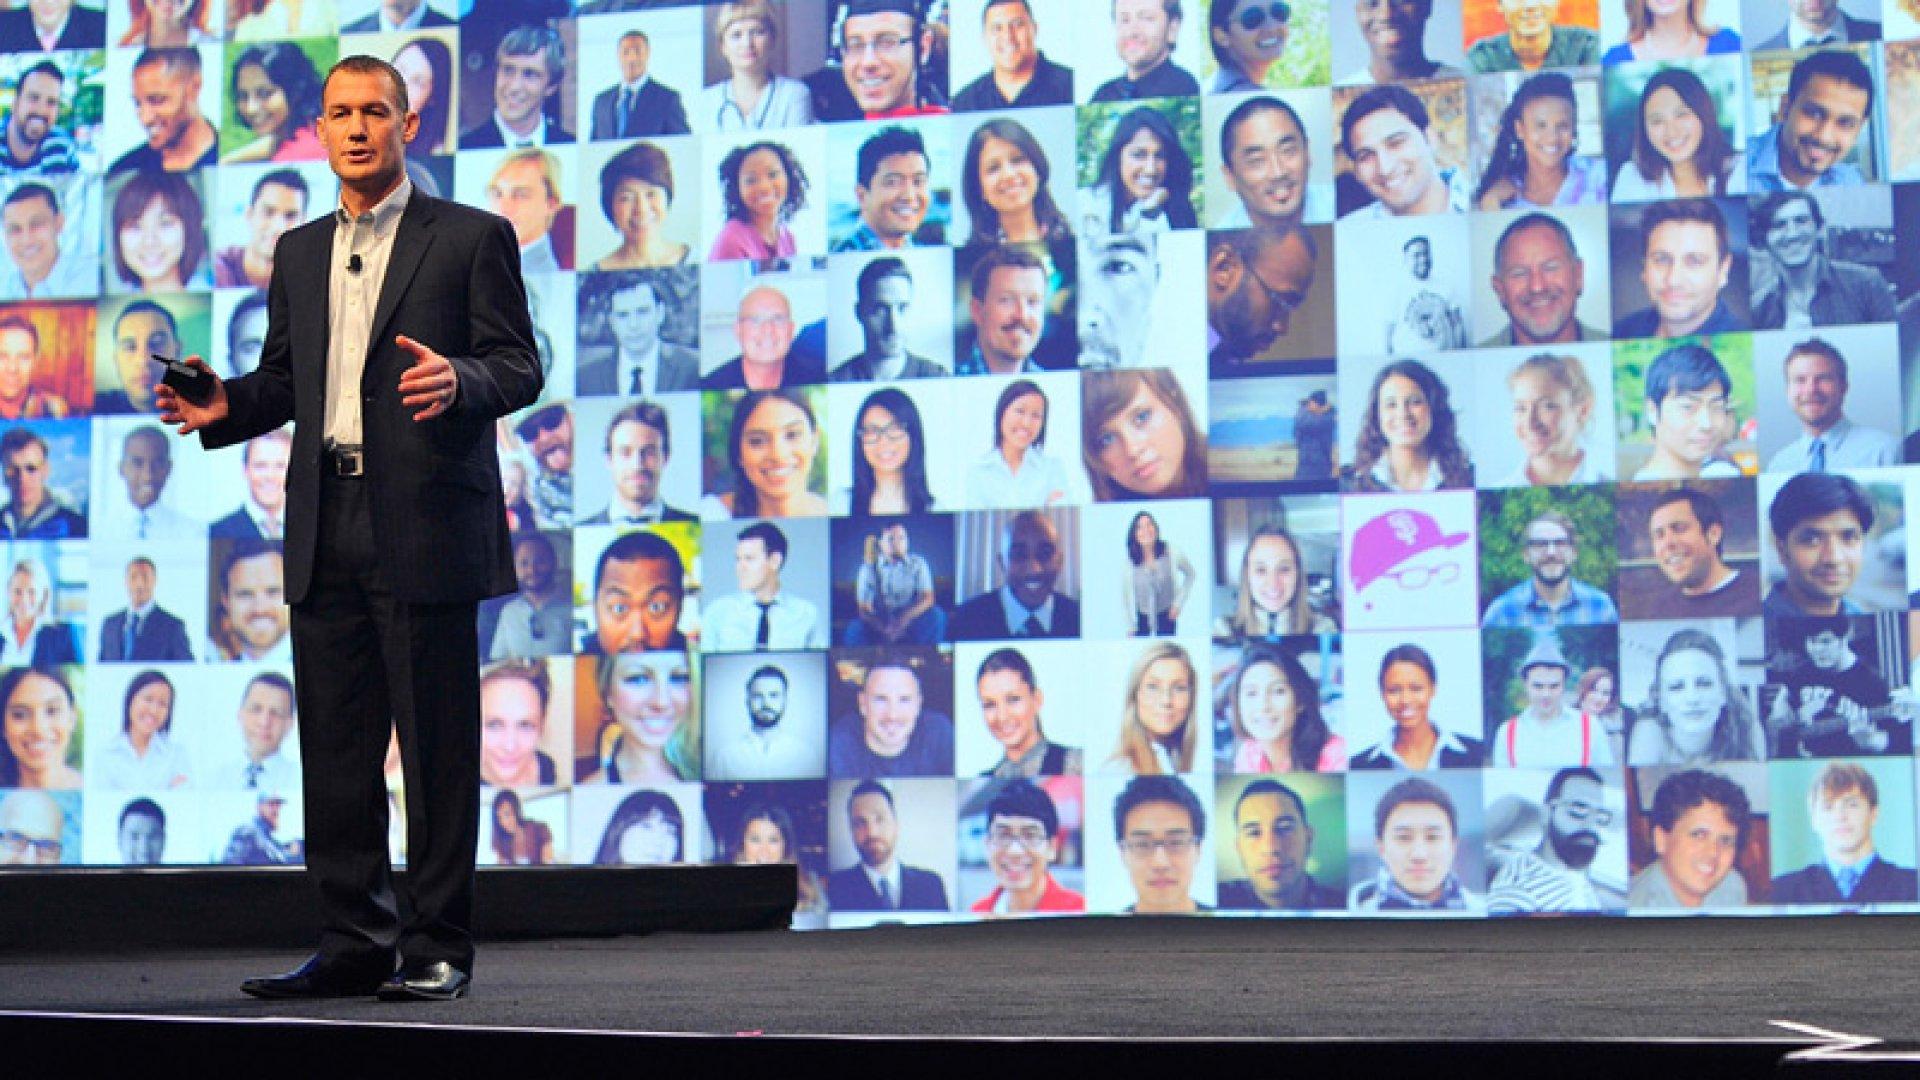 Wade Burgess, LinkedIn's VP of talent solutions